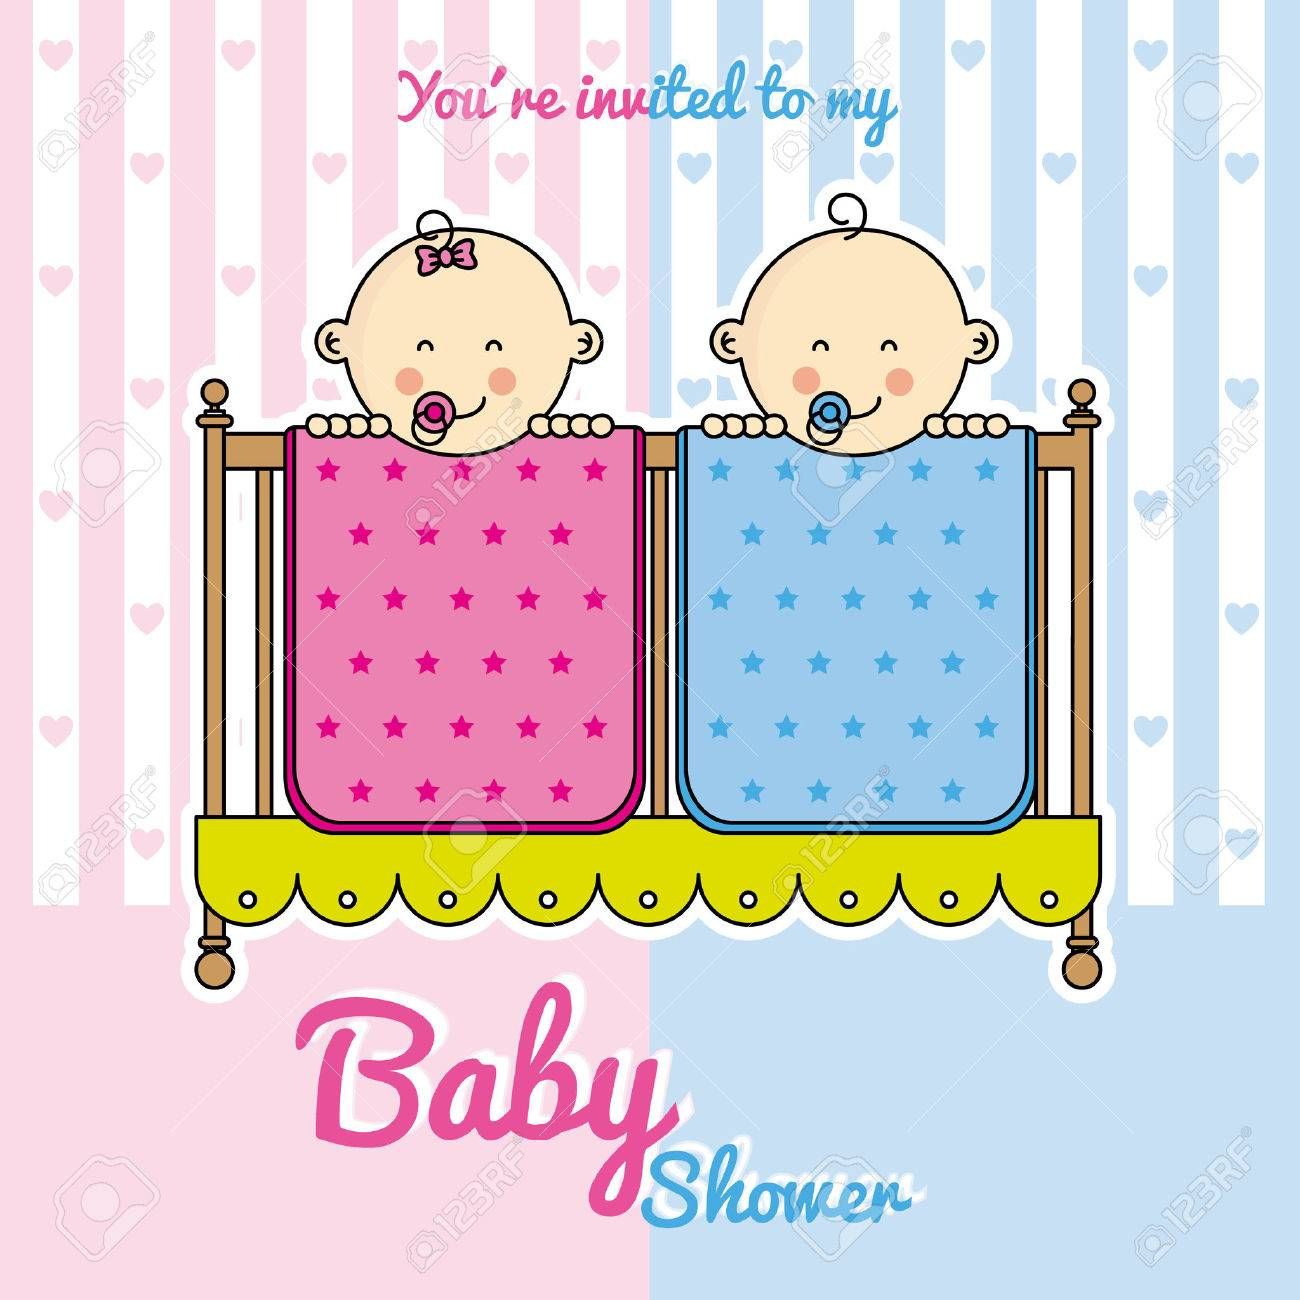 Twins baby shower. babies in the cradle. Stock Vector - 47617319